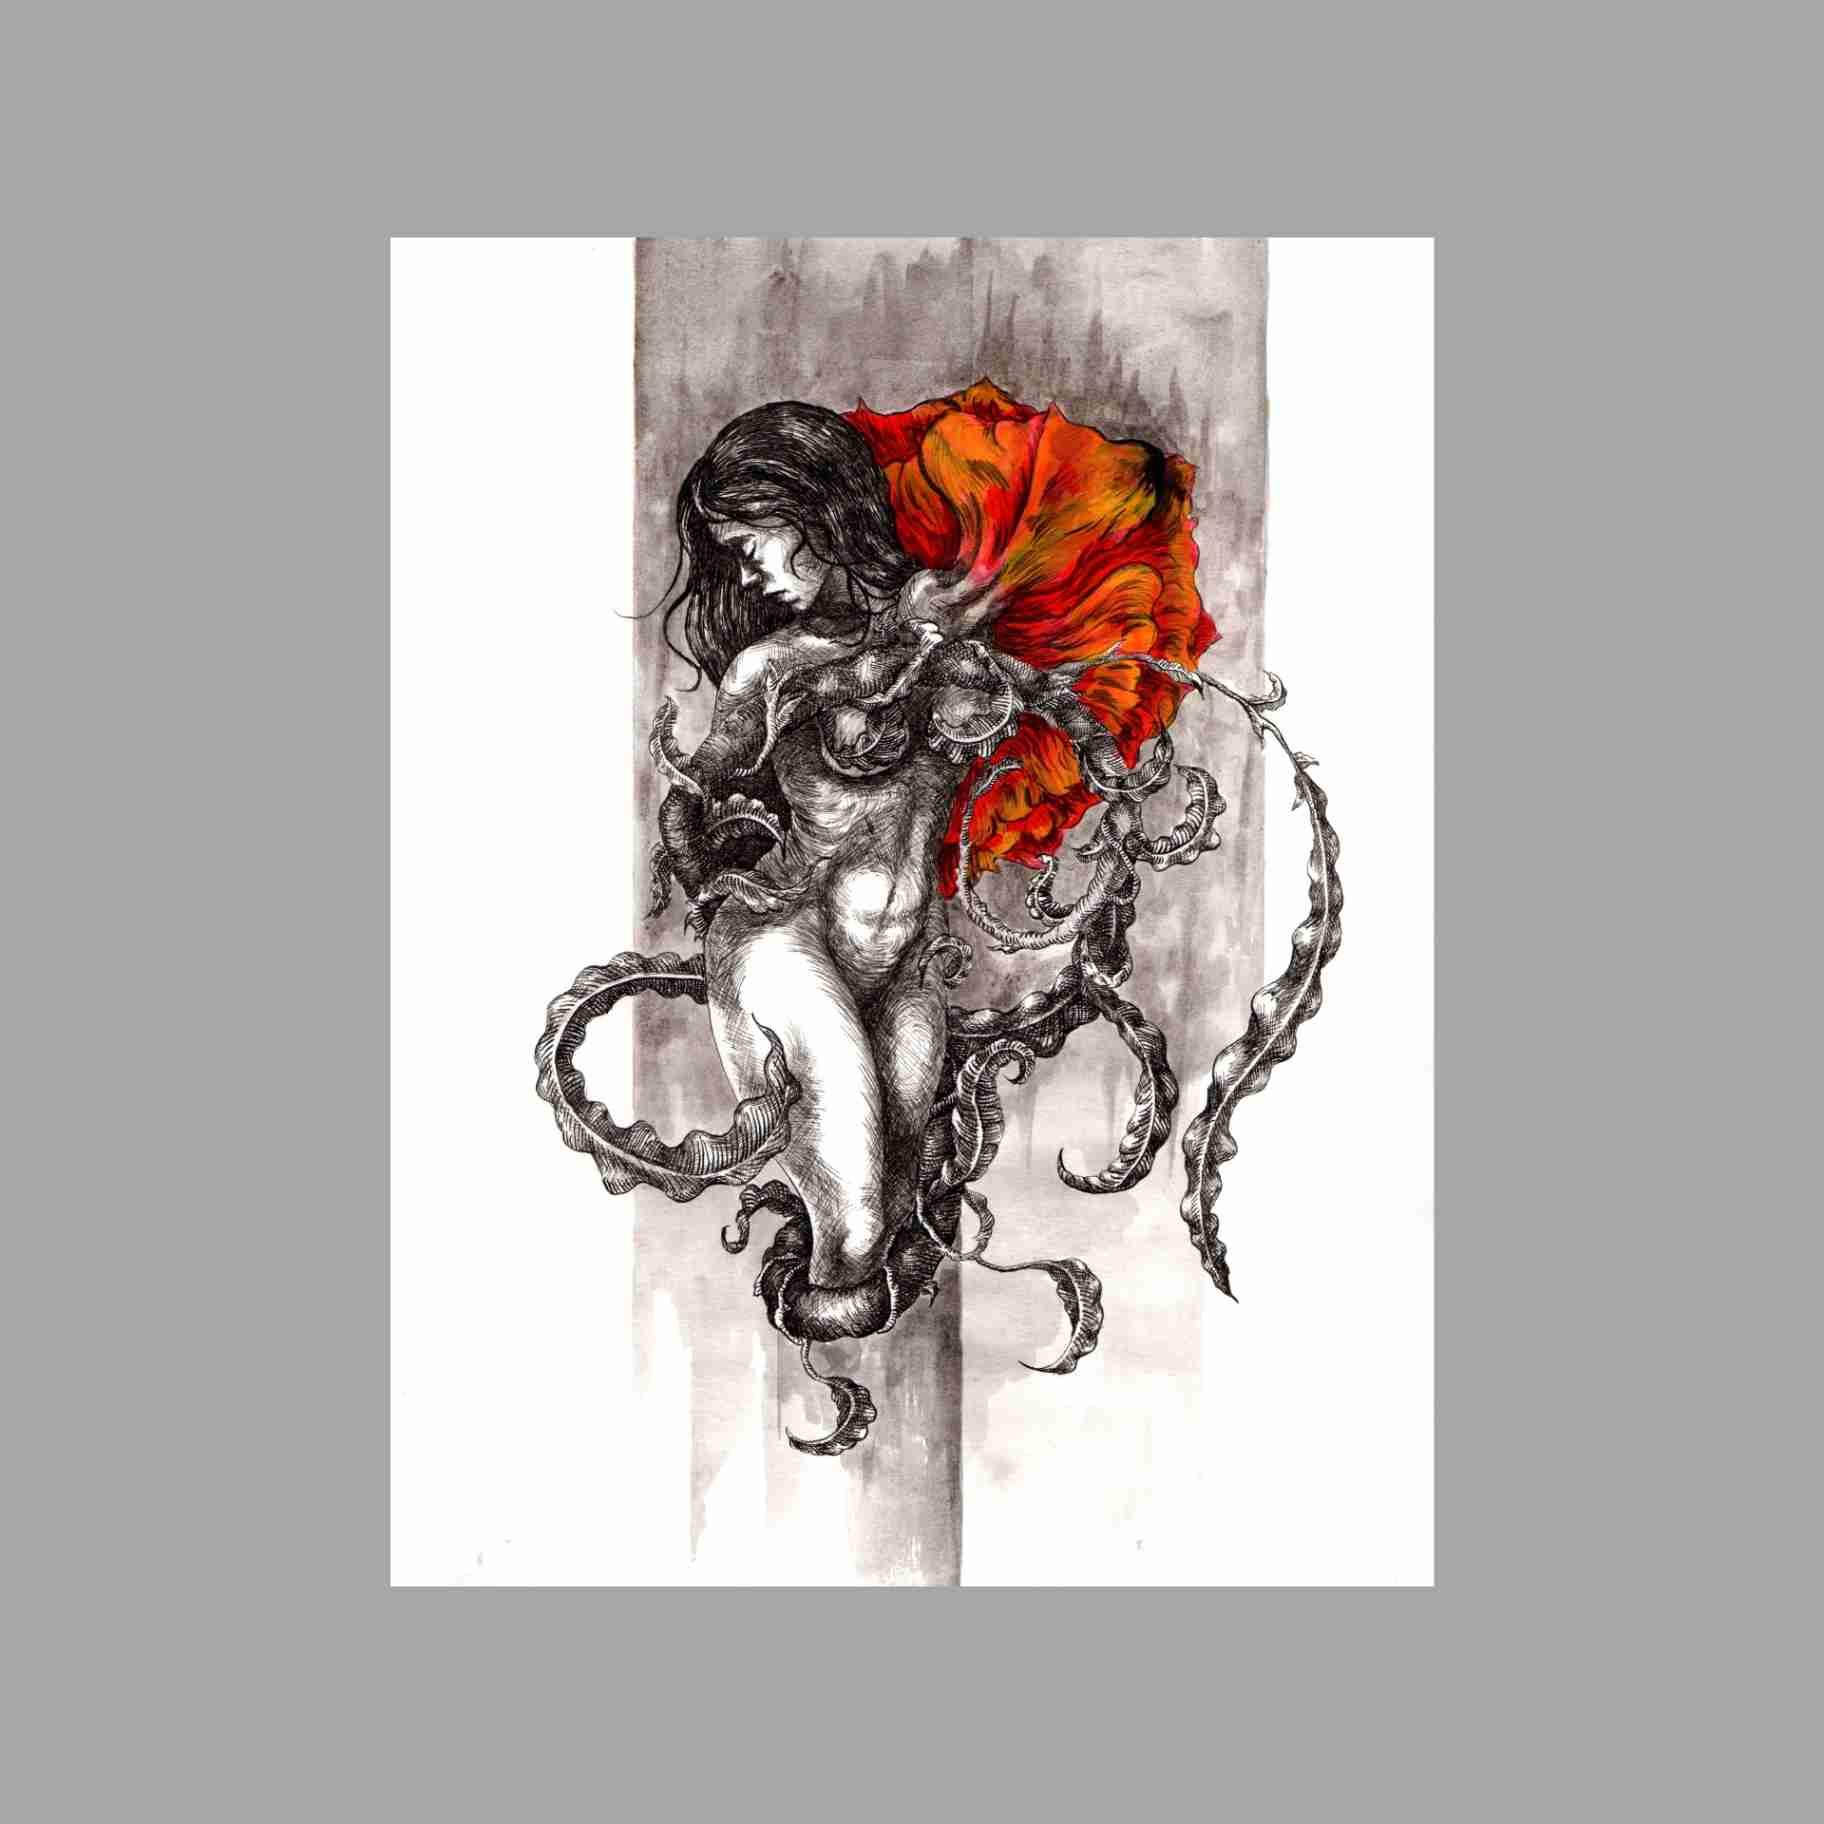 Obra: Nace una Rosa